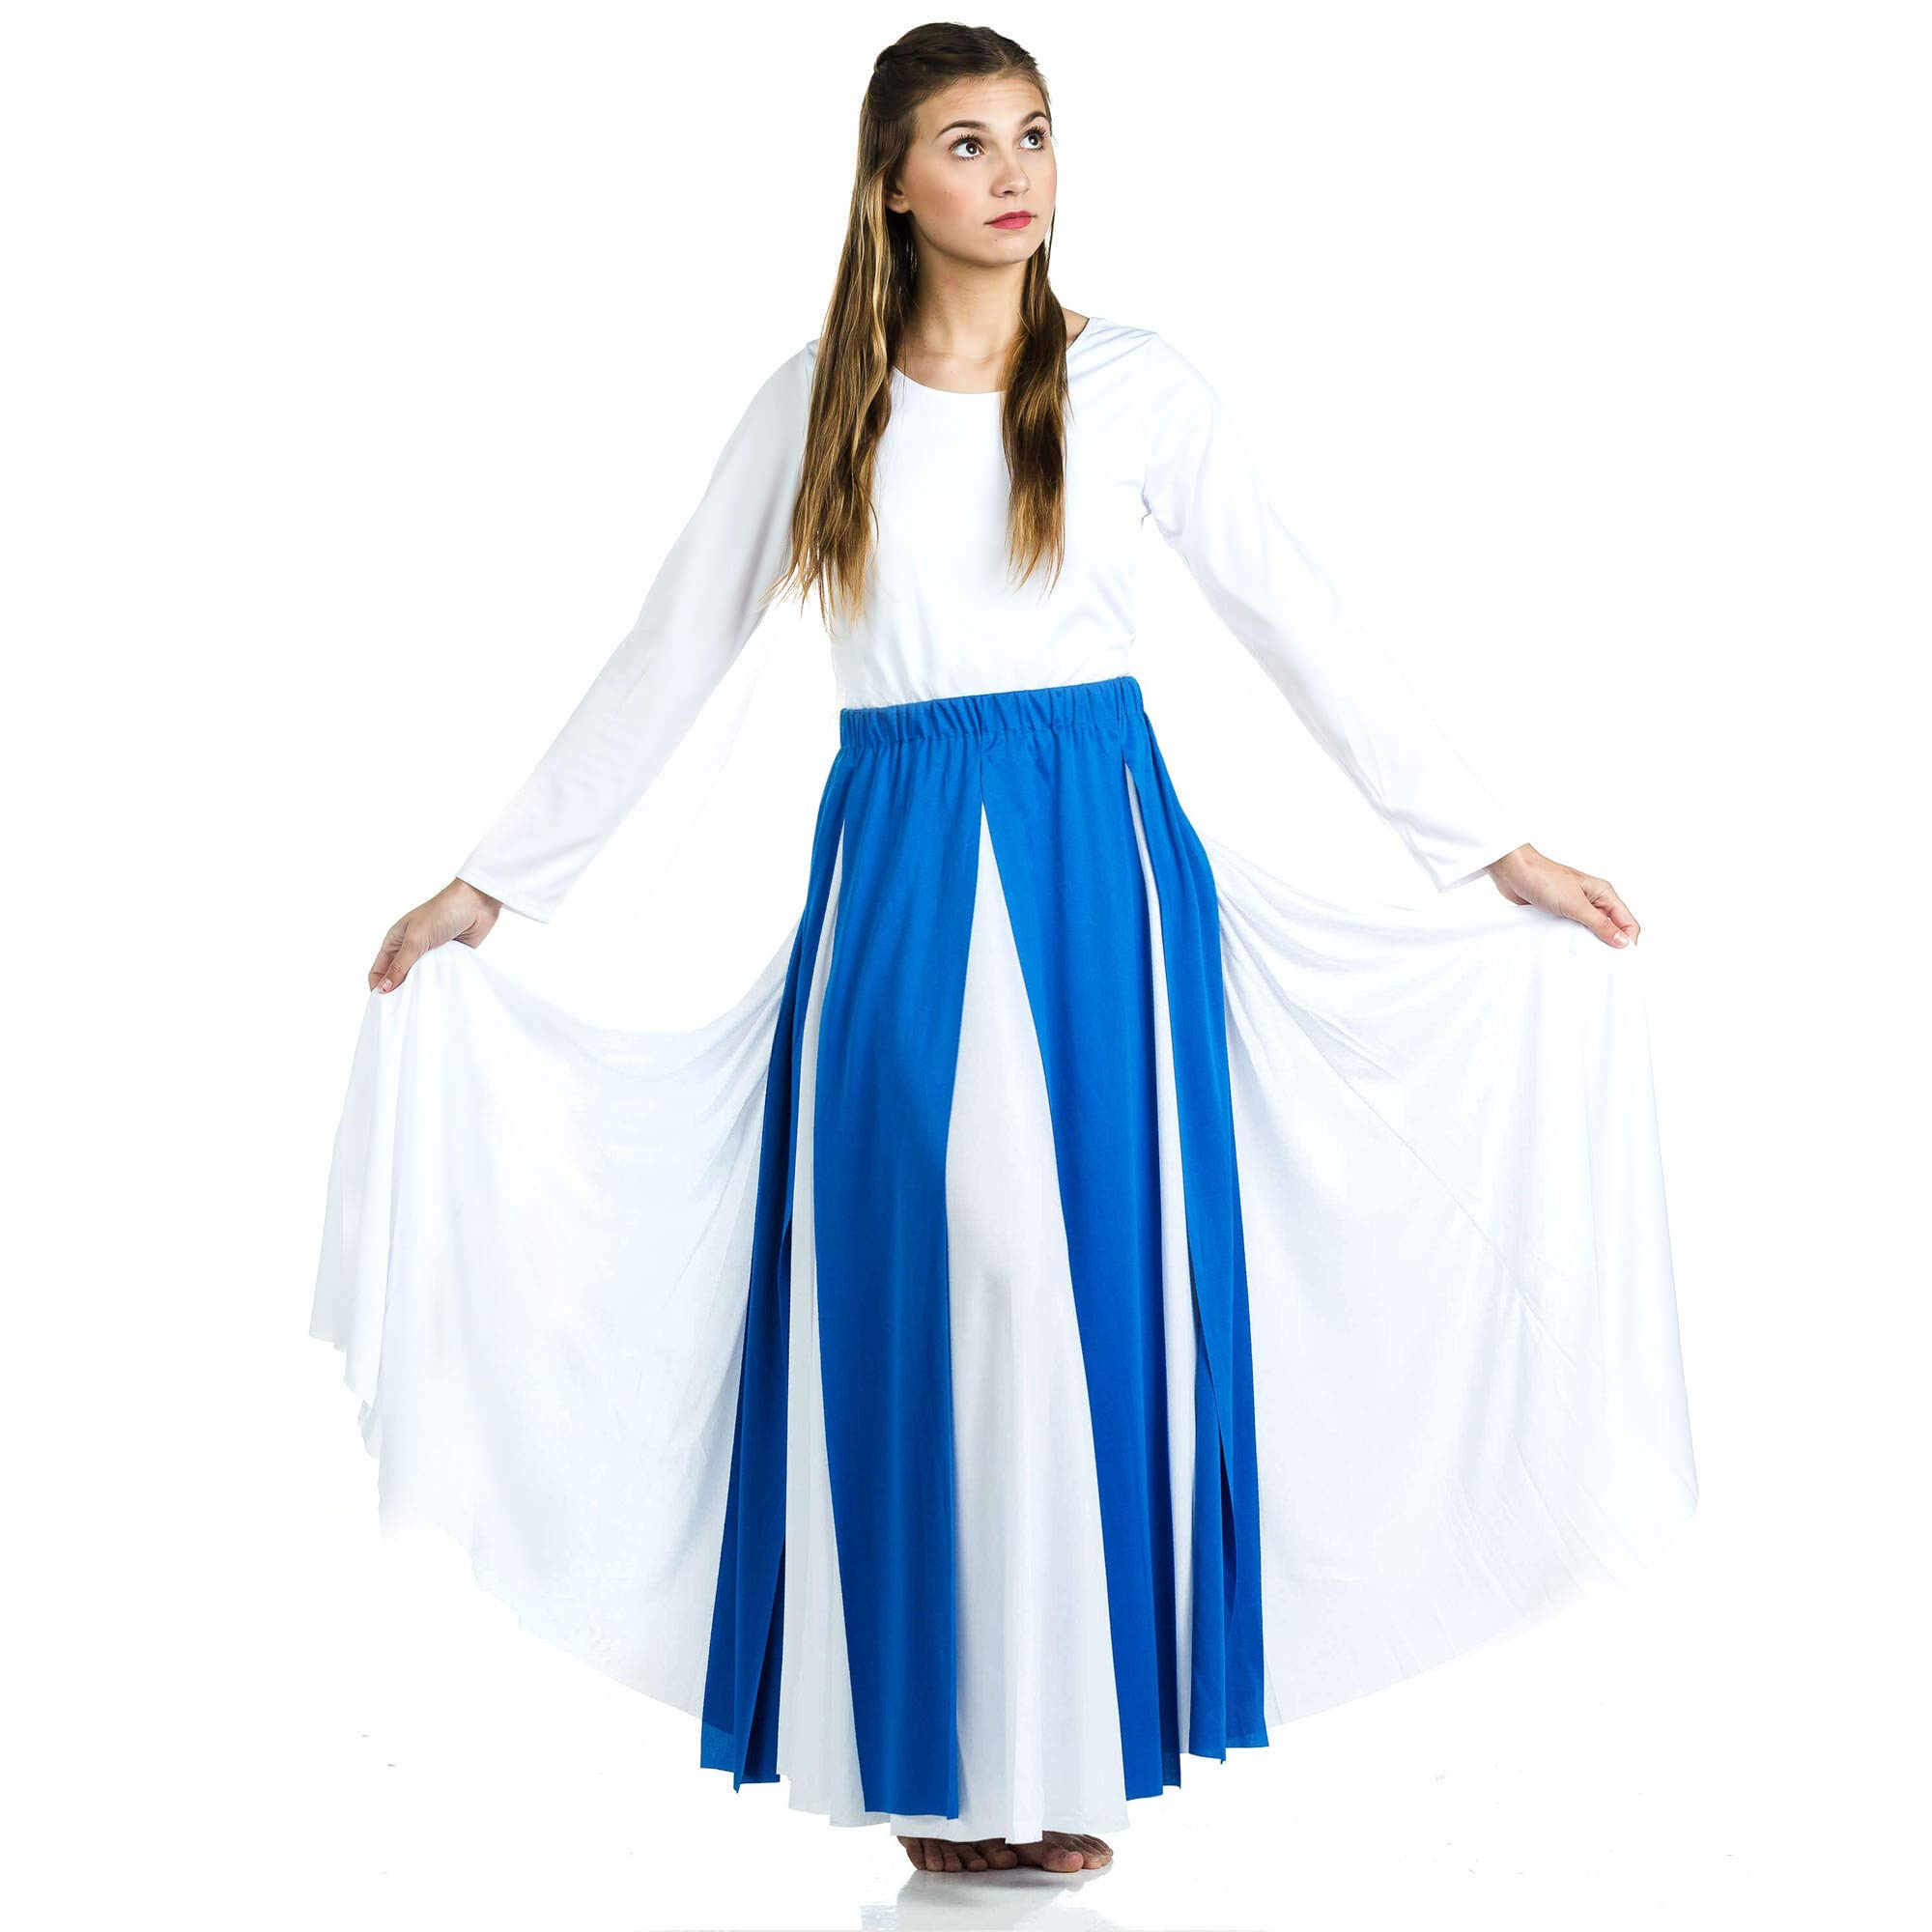 Danzcue Praise Dance Streamer Skirt, Bright Royal, S-M-Adult by Danzcue